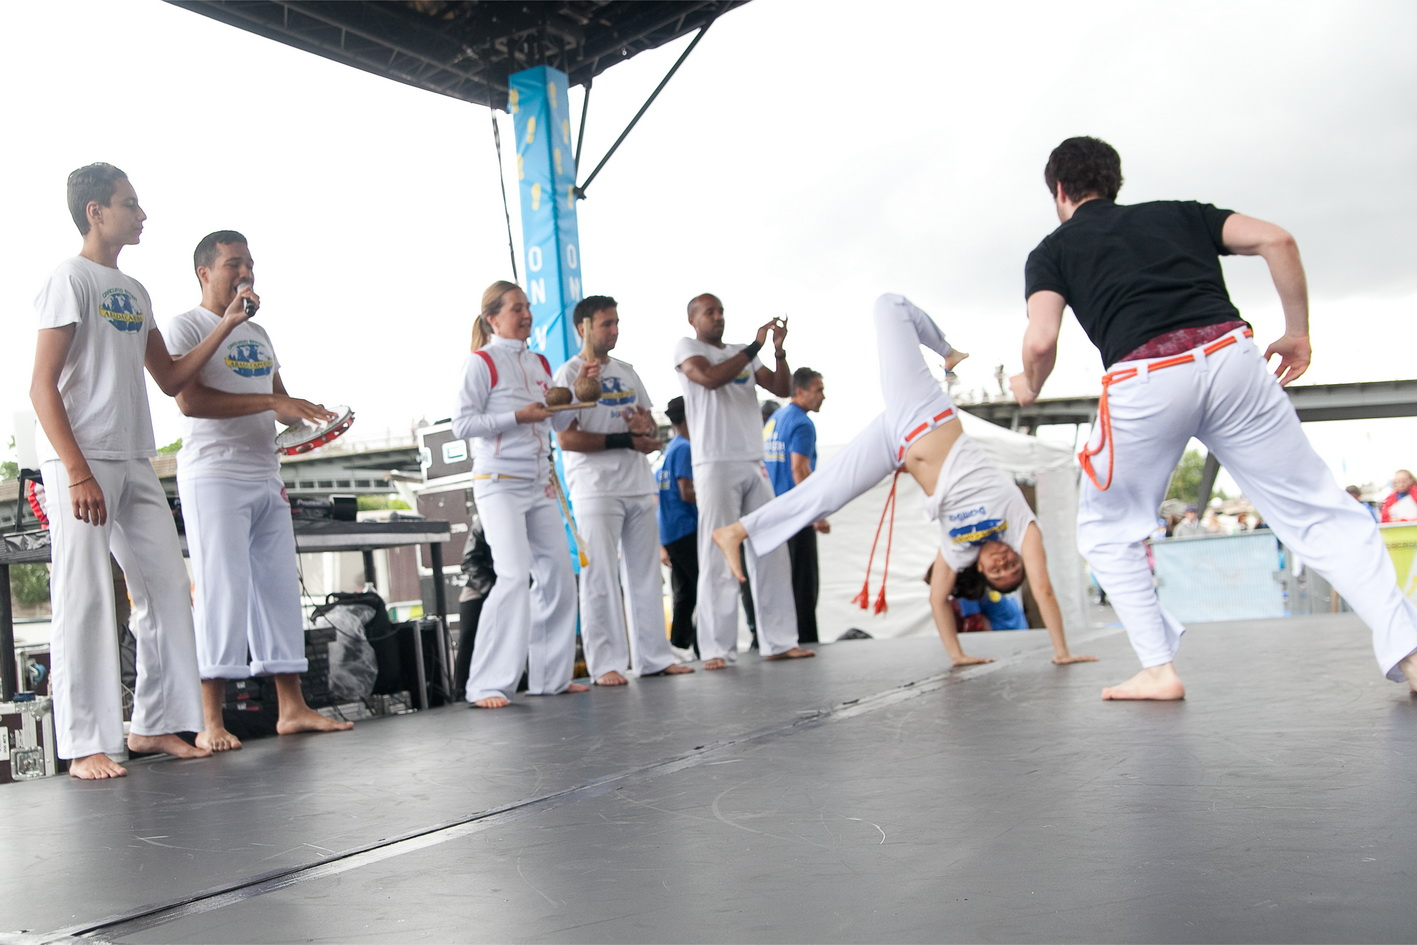 capoeira-paris-2014-demonstration